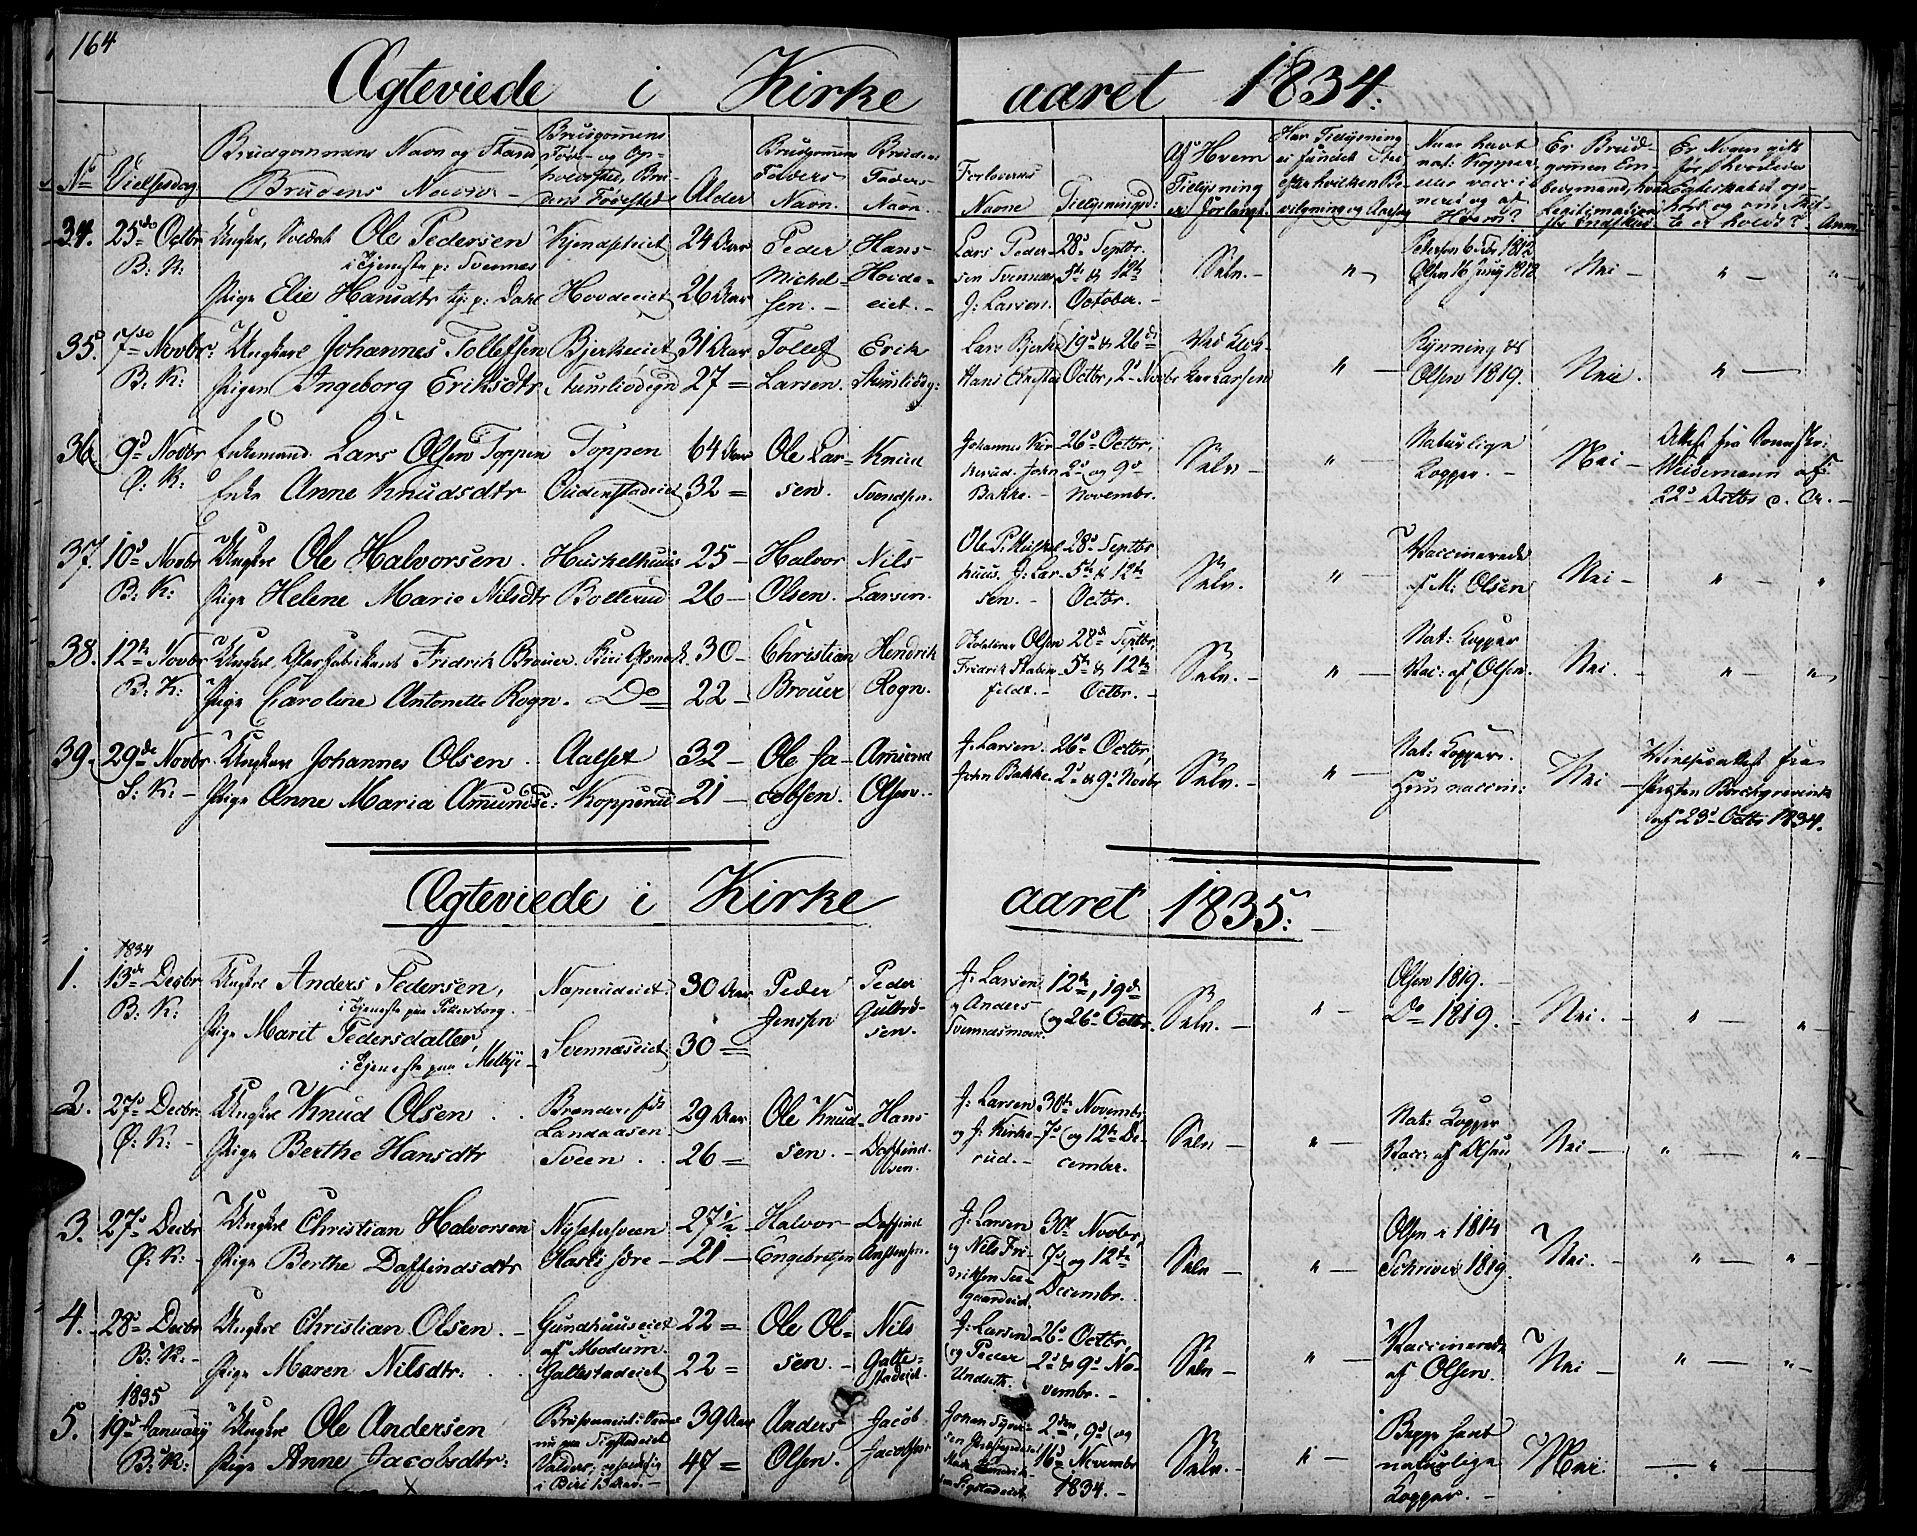 SAH, Biri prestekontor, Ministerialbok nr. 4, 1829-1842, s. 164